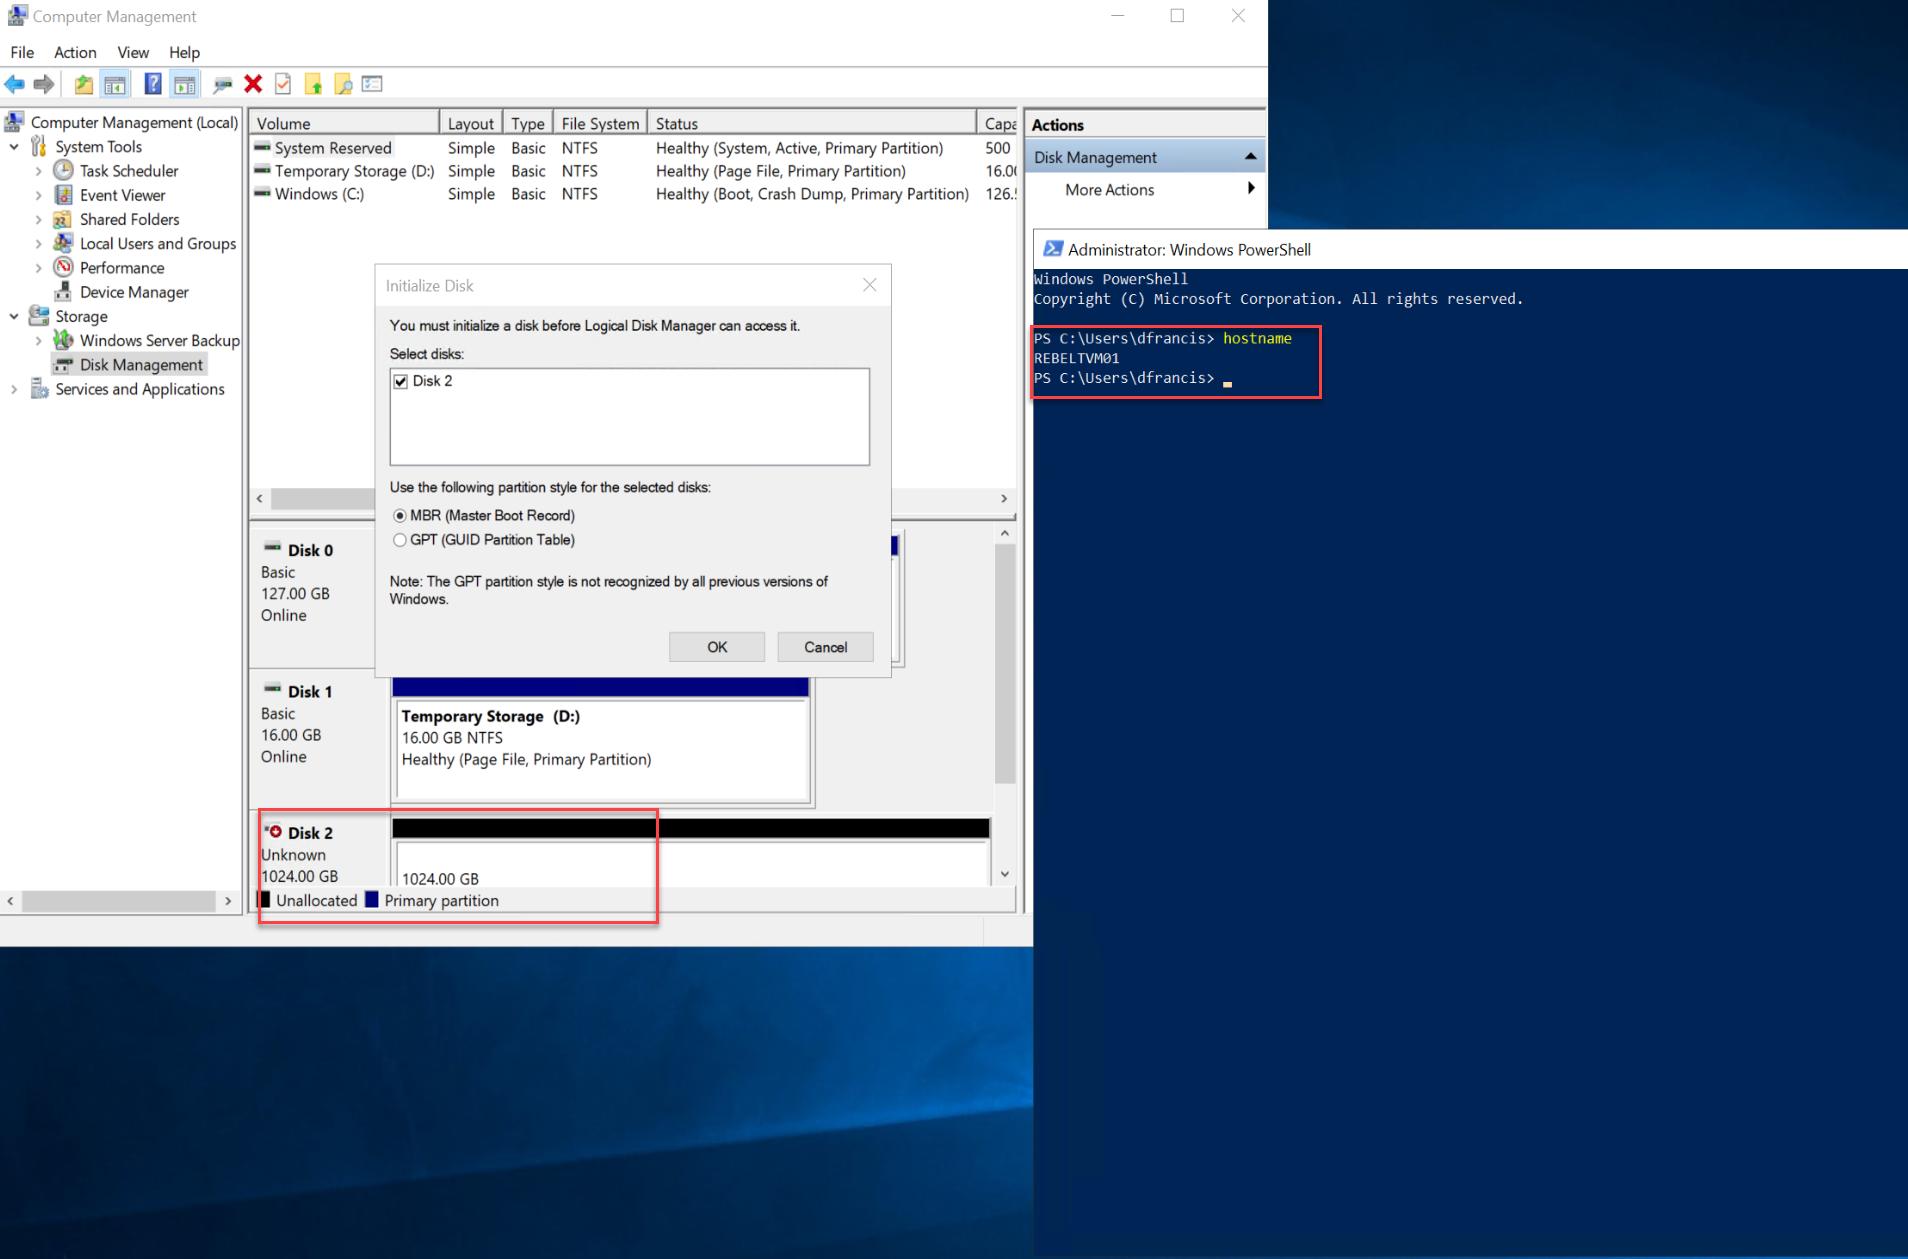 Computer Management settings for REBELTVM01